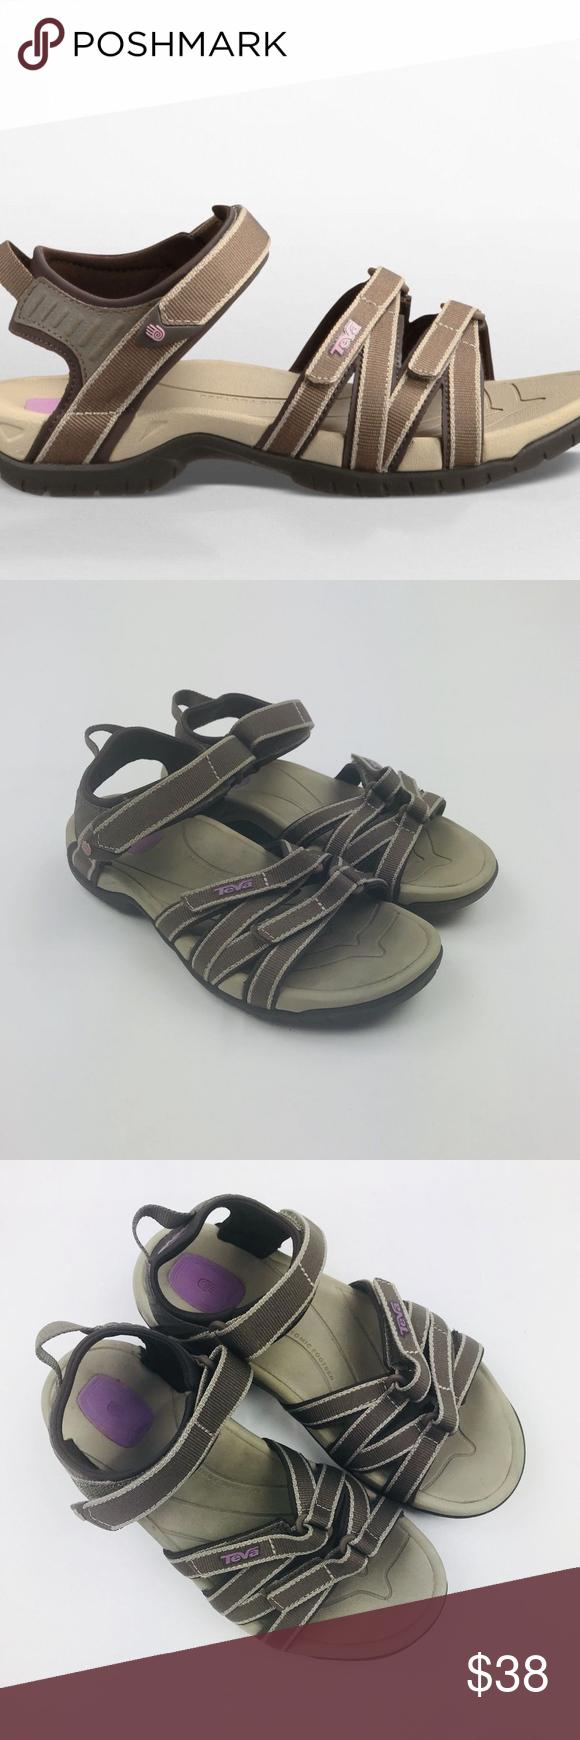 43dc8bbb20d1 Teva Adjustable Comfort Walking Sandal 5.5 Teva Women s Tirra Chocolate  Chip Strappy Adjustable Comfort Walking Sandal 5.5 Overall good